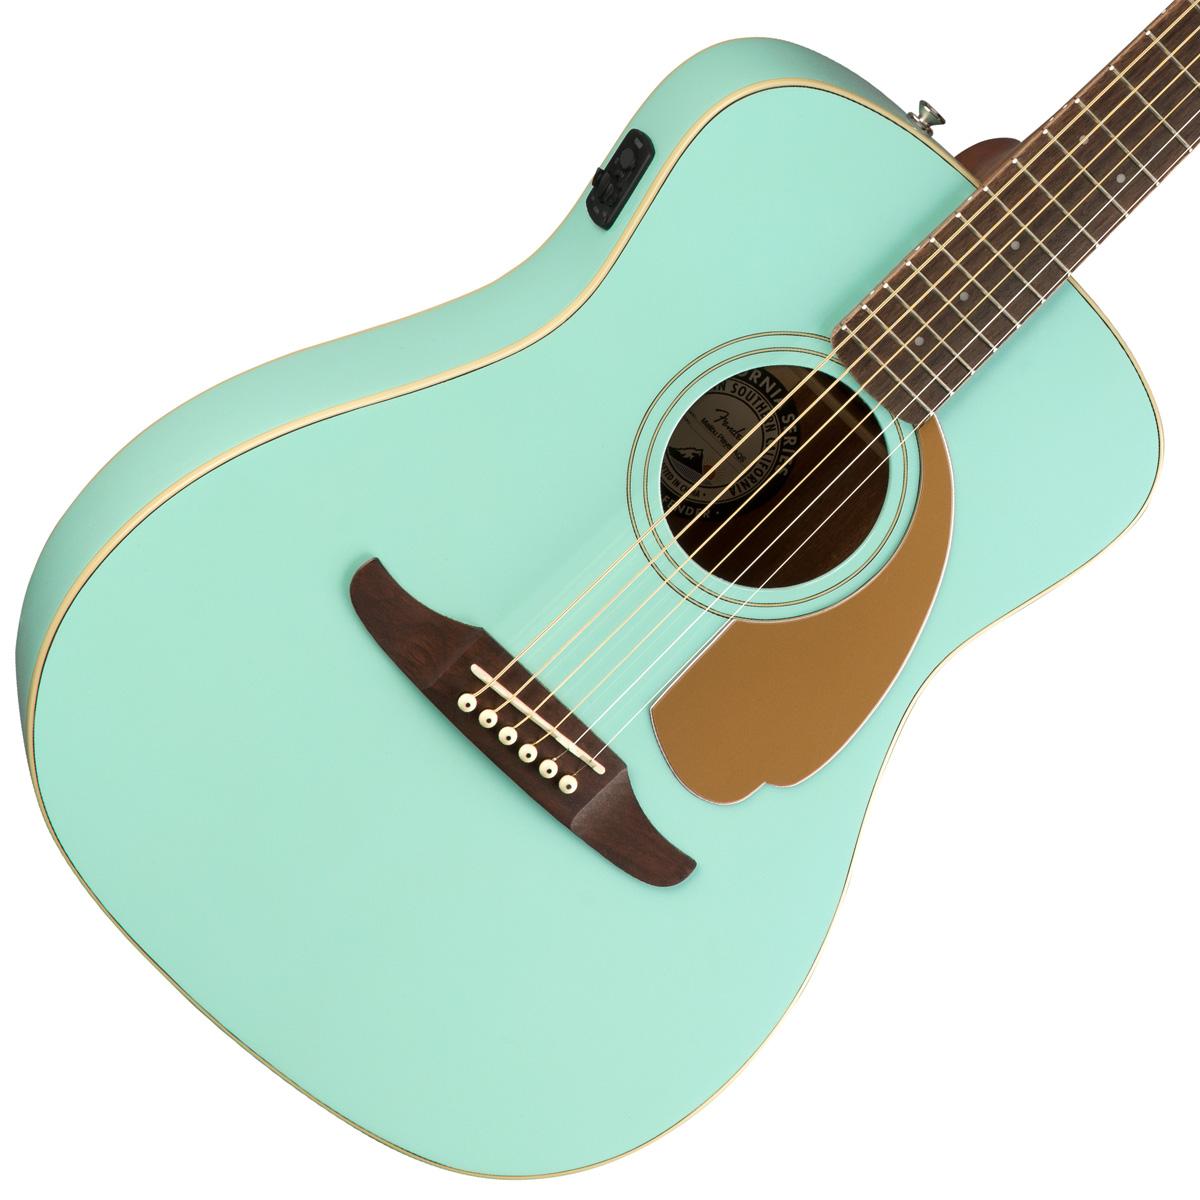 FENDER / MALIBU PLAYER AQUA SPLASH (AQS)【CALIFORNIA SERIES】フェンダー アコースティックギター【梅田店】